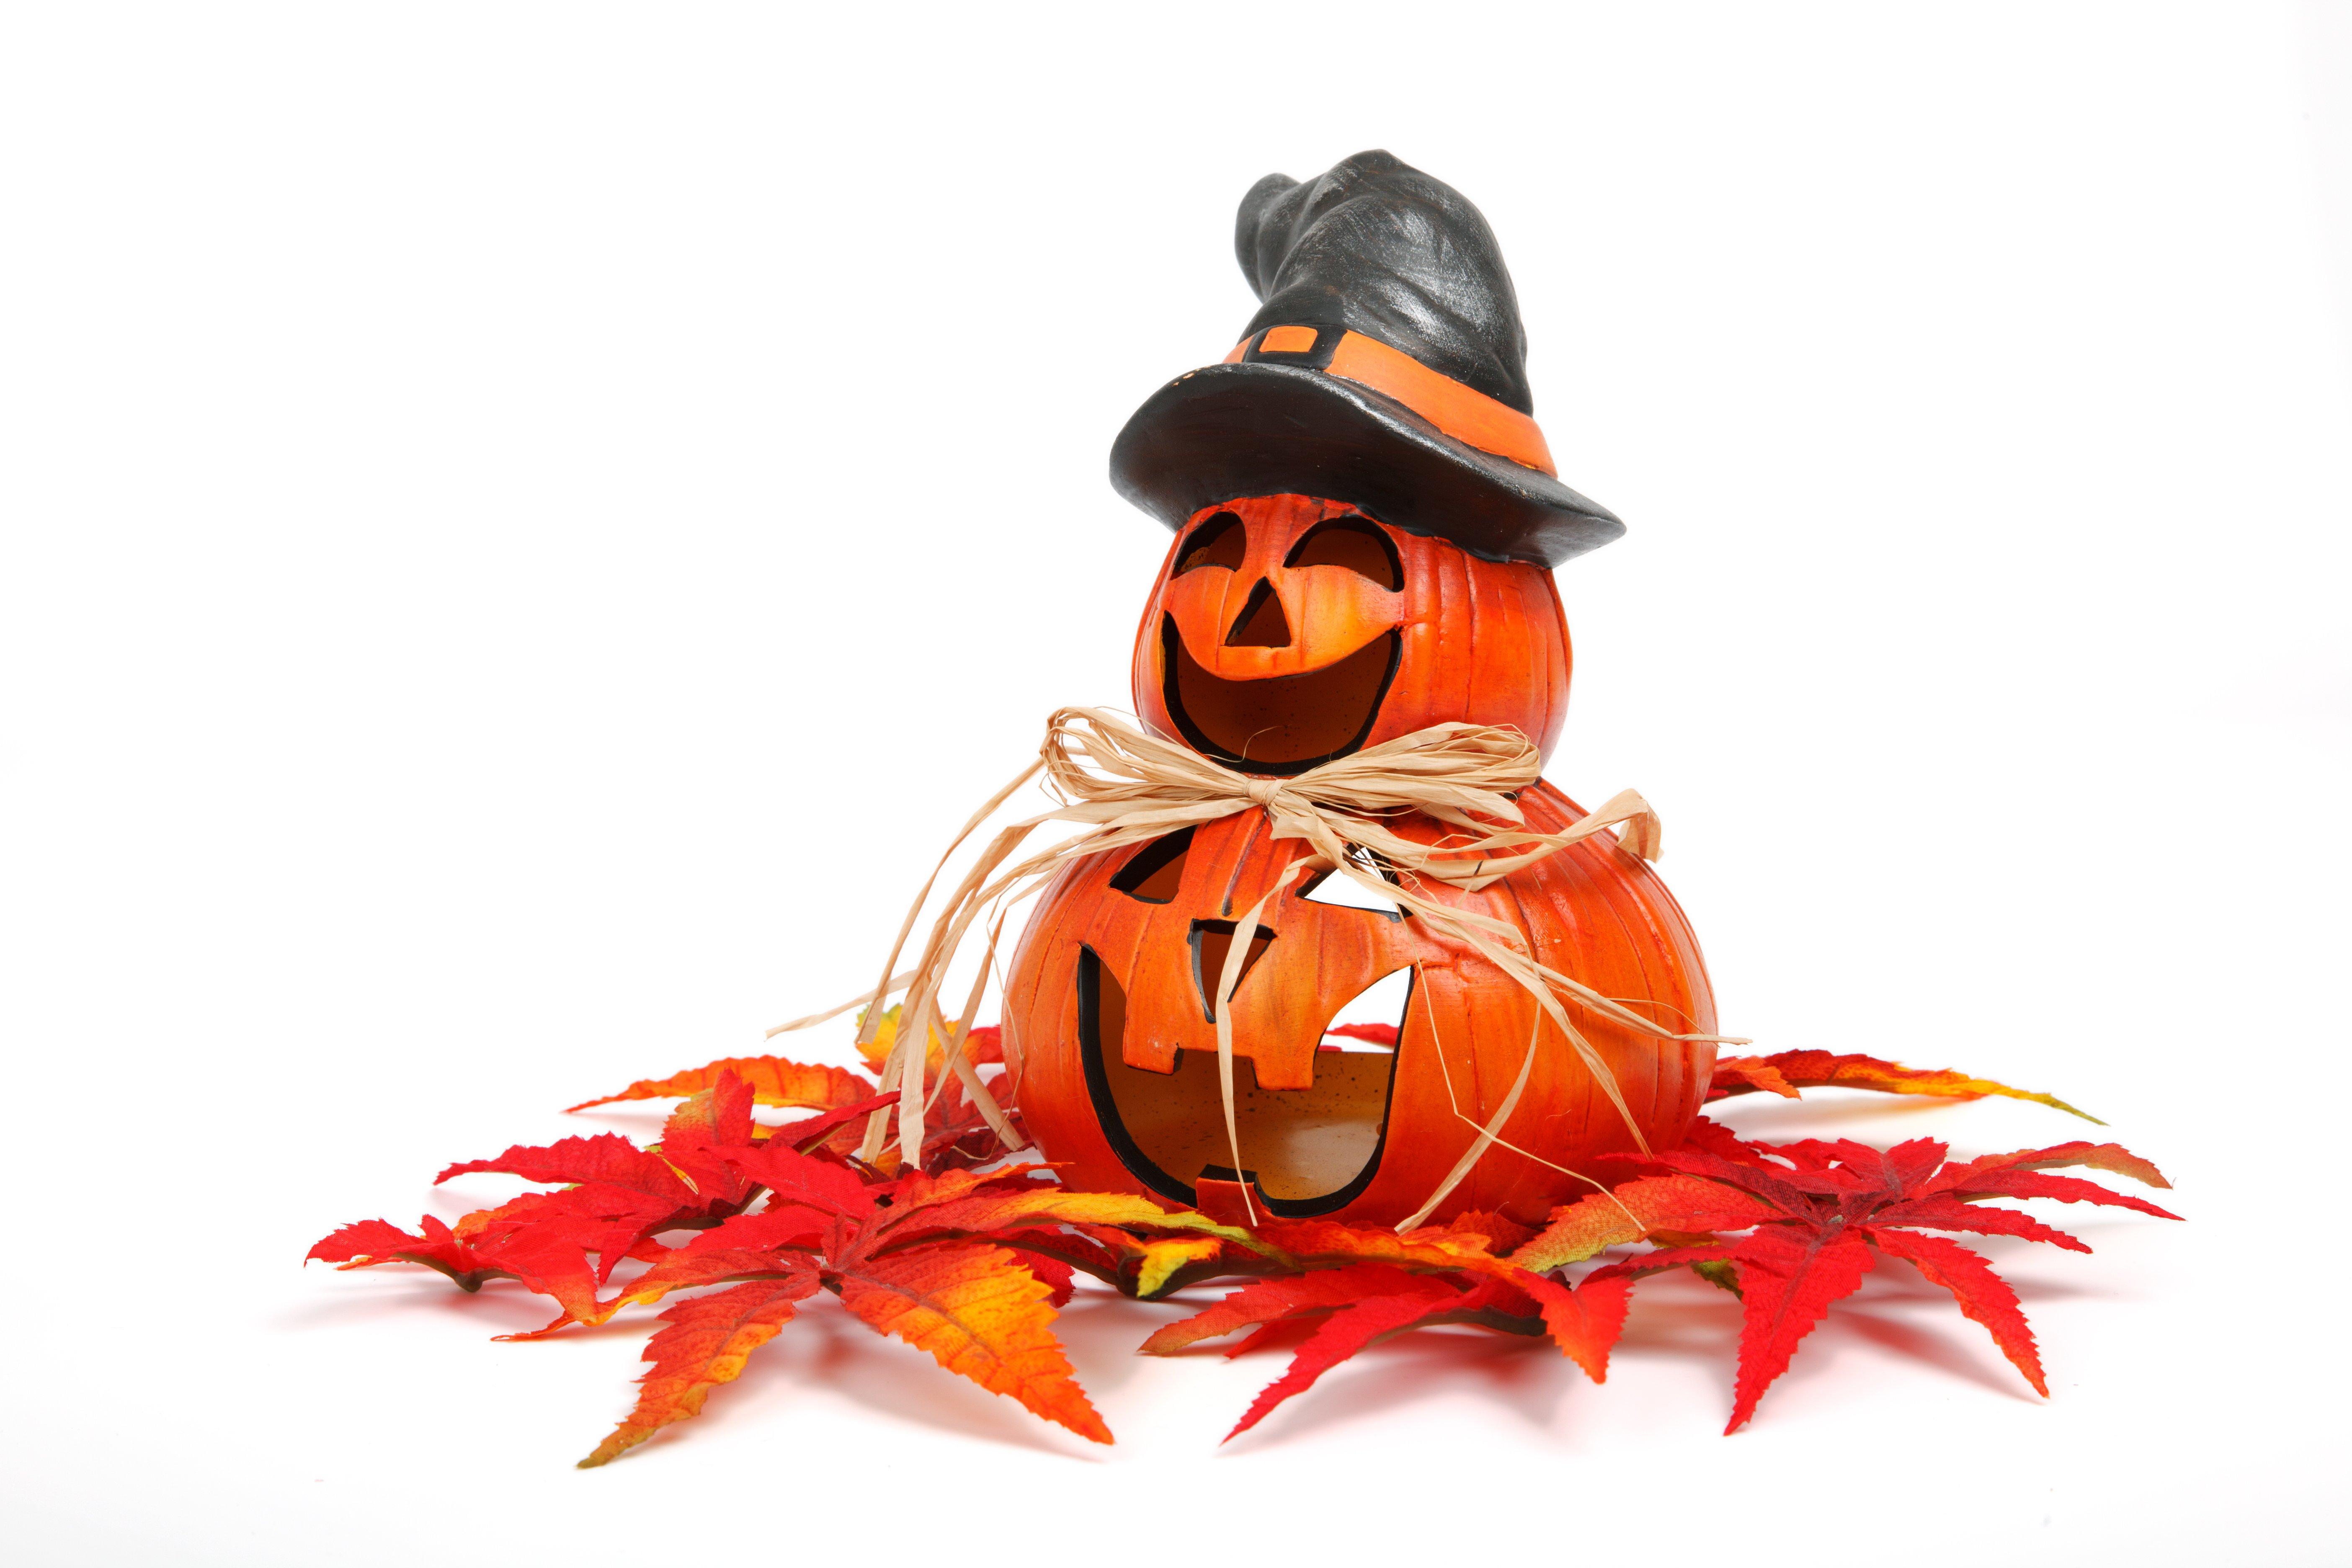 Two halloween pumpkins photo